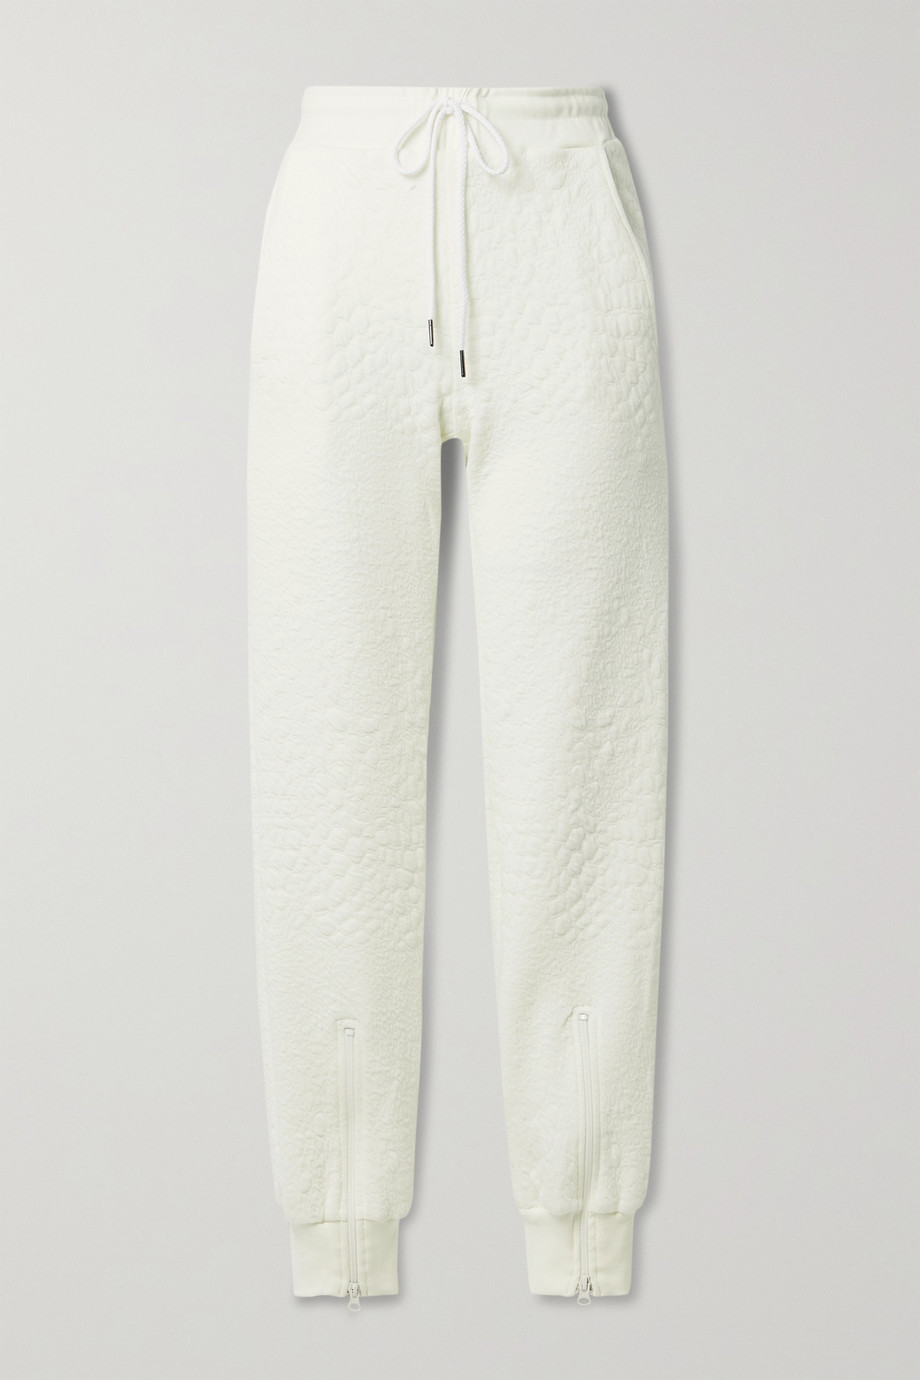 TWENTY Montréal Caiman textured-jersey track pants